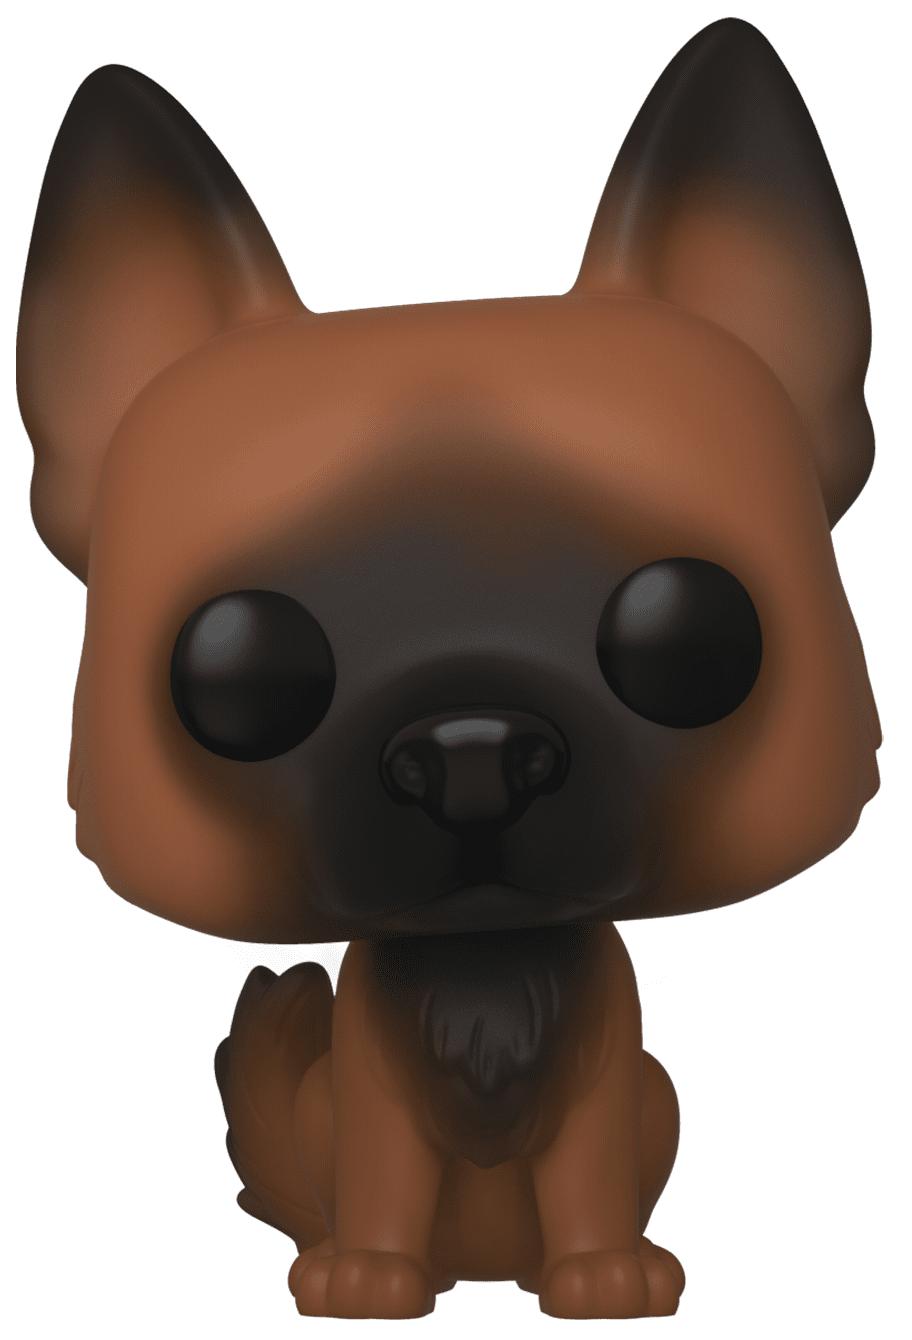 The Walking Dead - Dog Pop! Vinyl Figure image